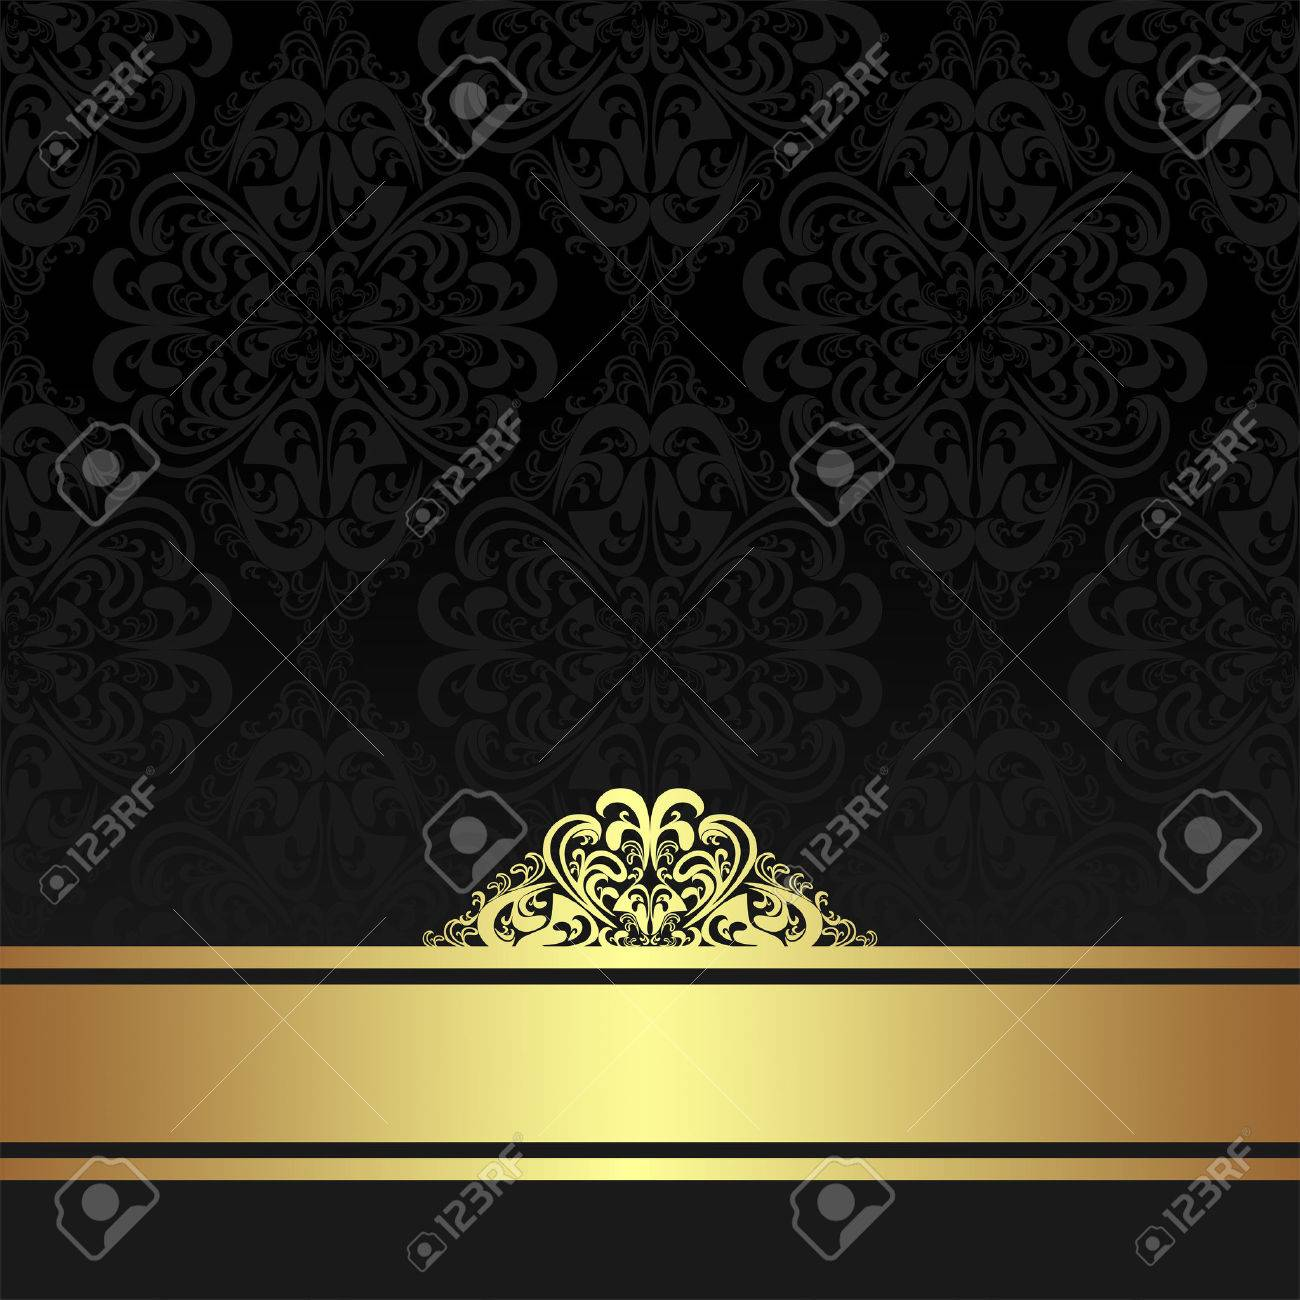 Damask black ornamental Background with golden Ribbon. - 41764002